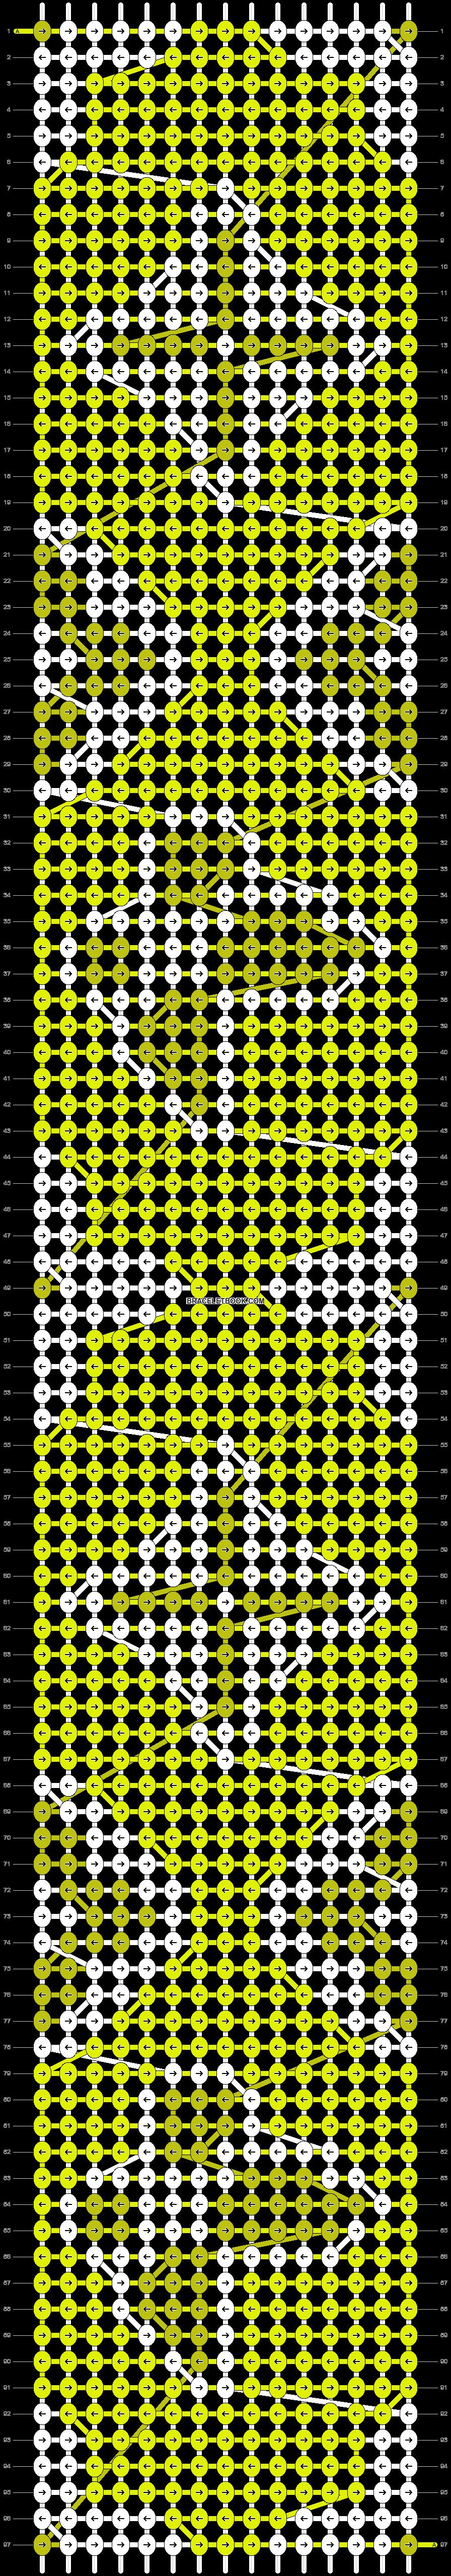 Alpha pattern #71838 variation #133144 pattern